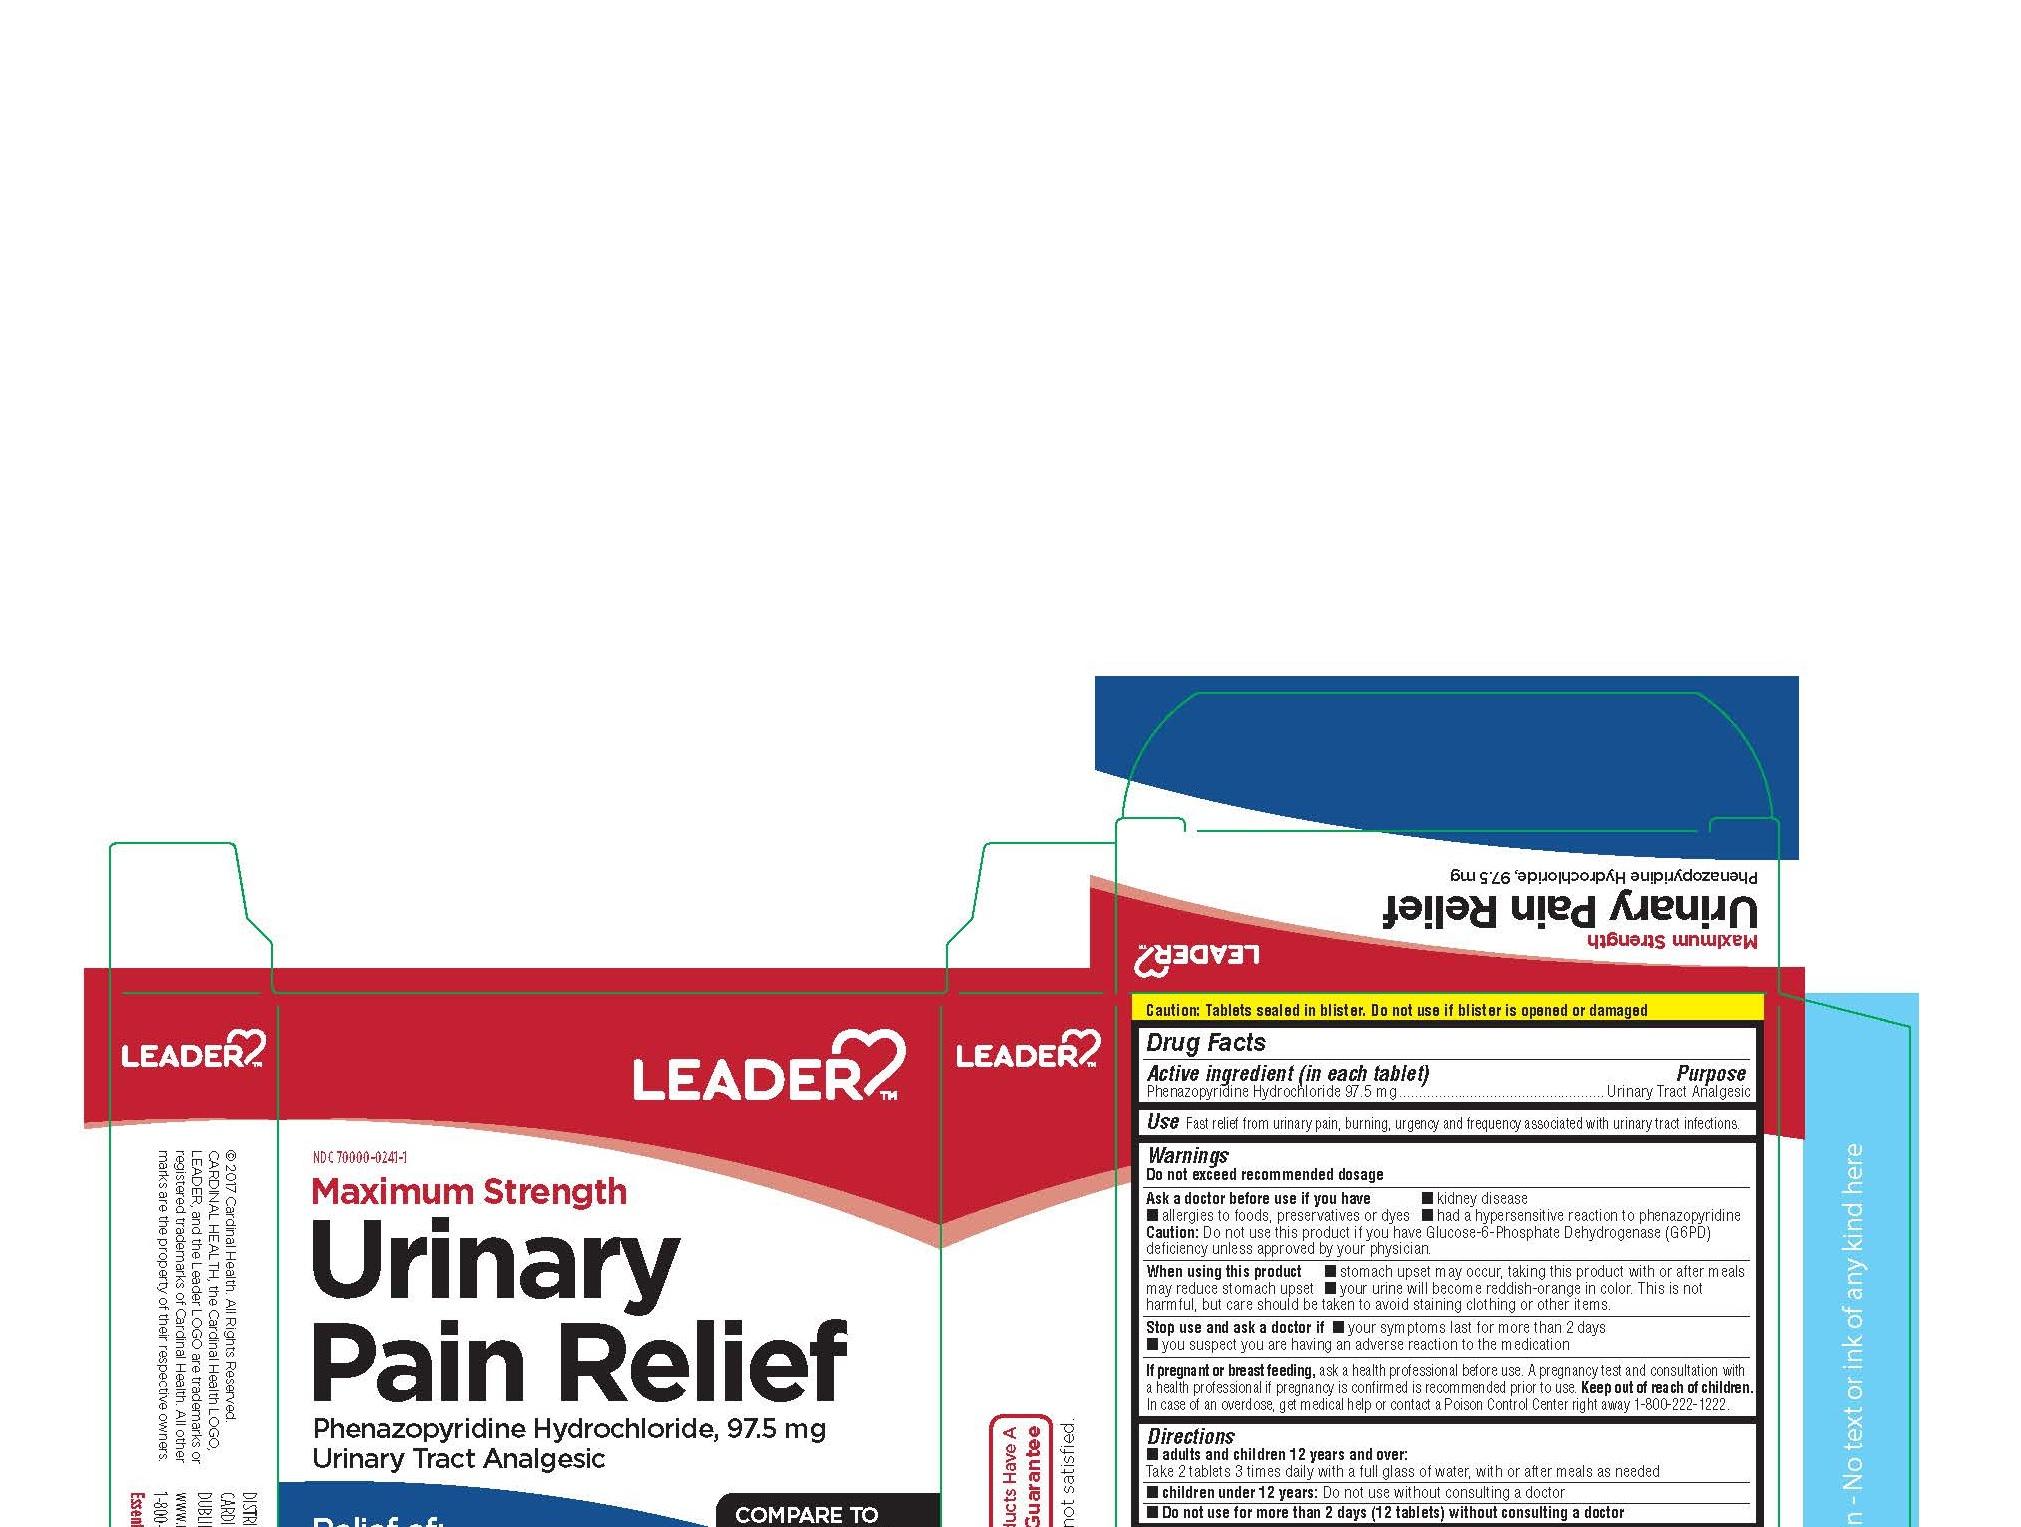 PHENAZOPYRIDINE HYDROCHLORIDE (Leader Maximum Strength Urinary Pain Relief)